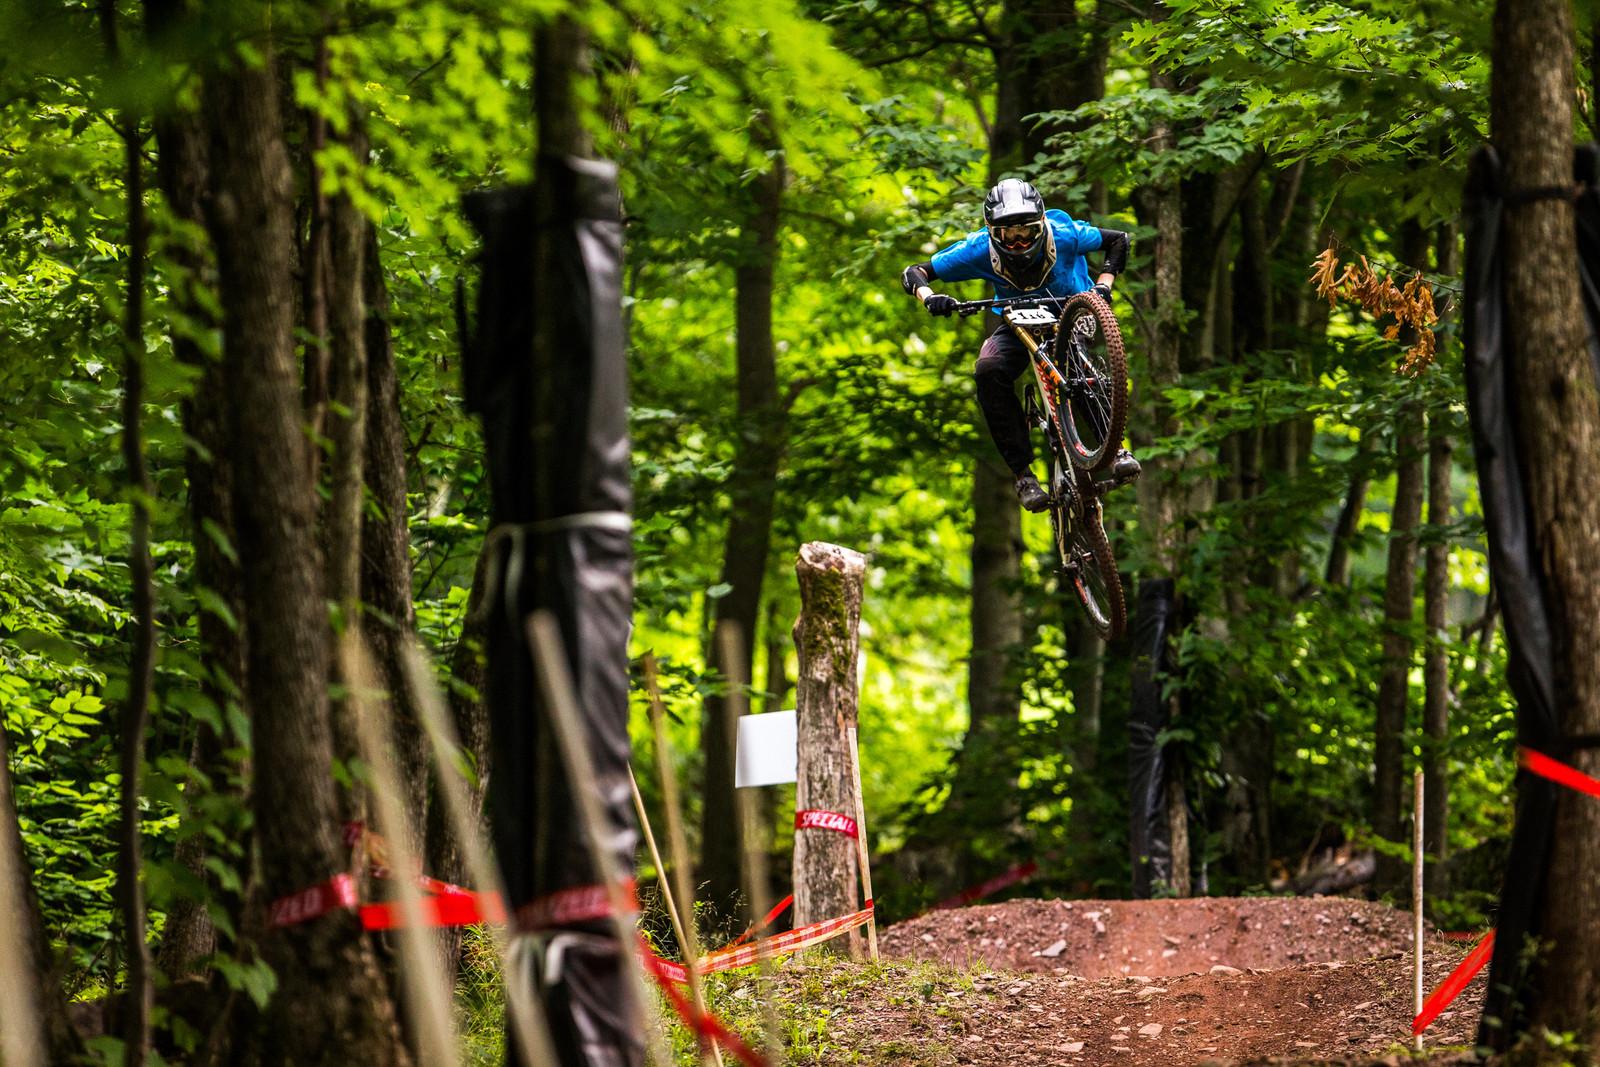 Matt Driscoll - RACE DAY GALLERY - 2017 Pro GRT, Windham, NY - Mountain Biking Pictures - Vital MTB